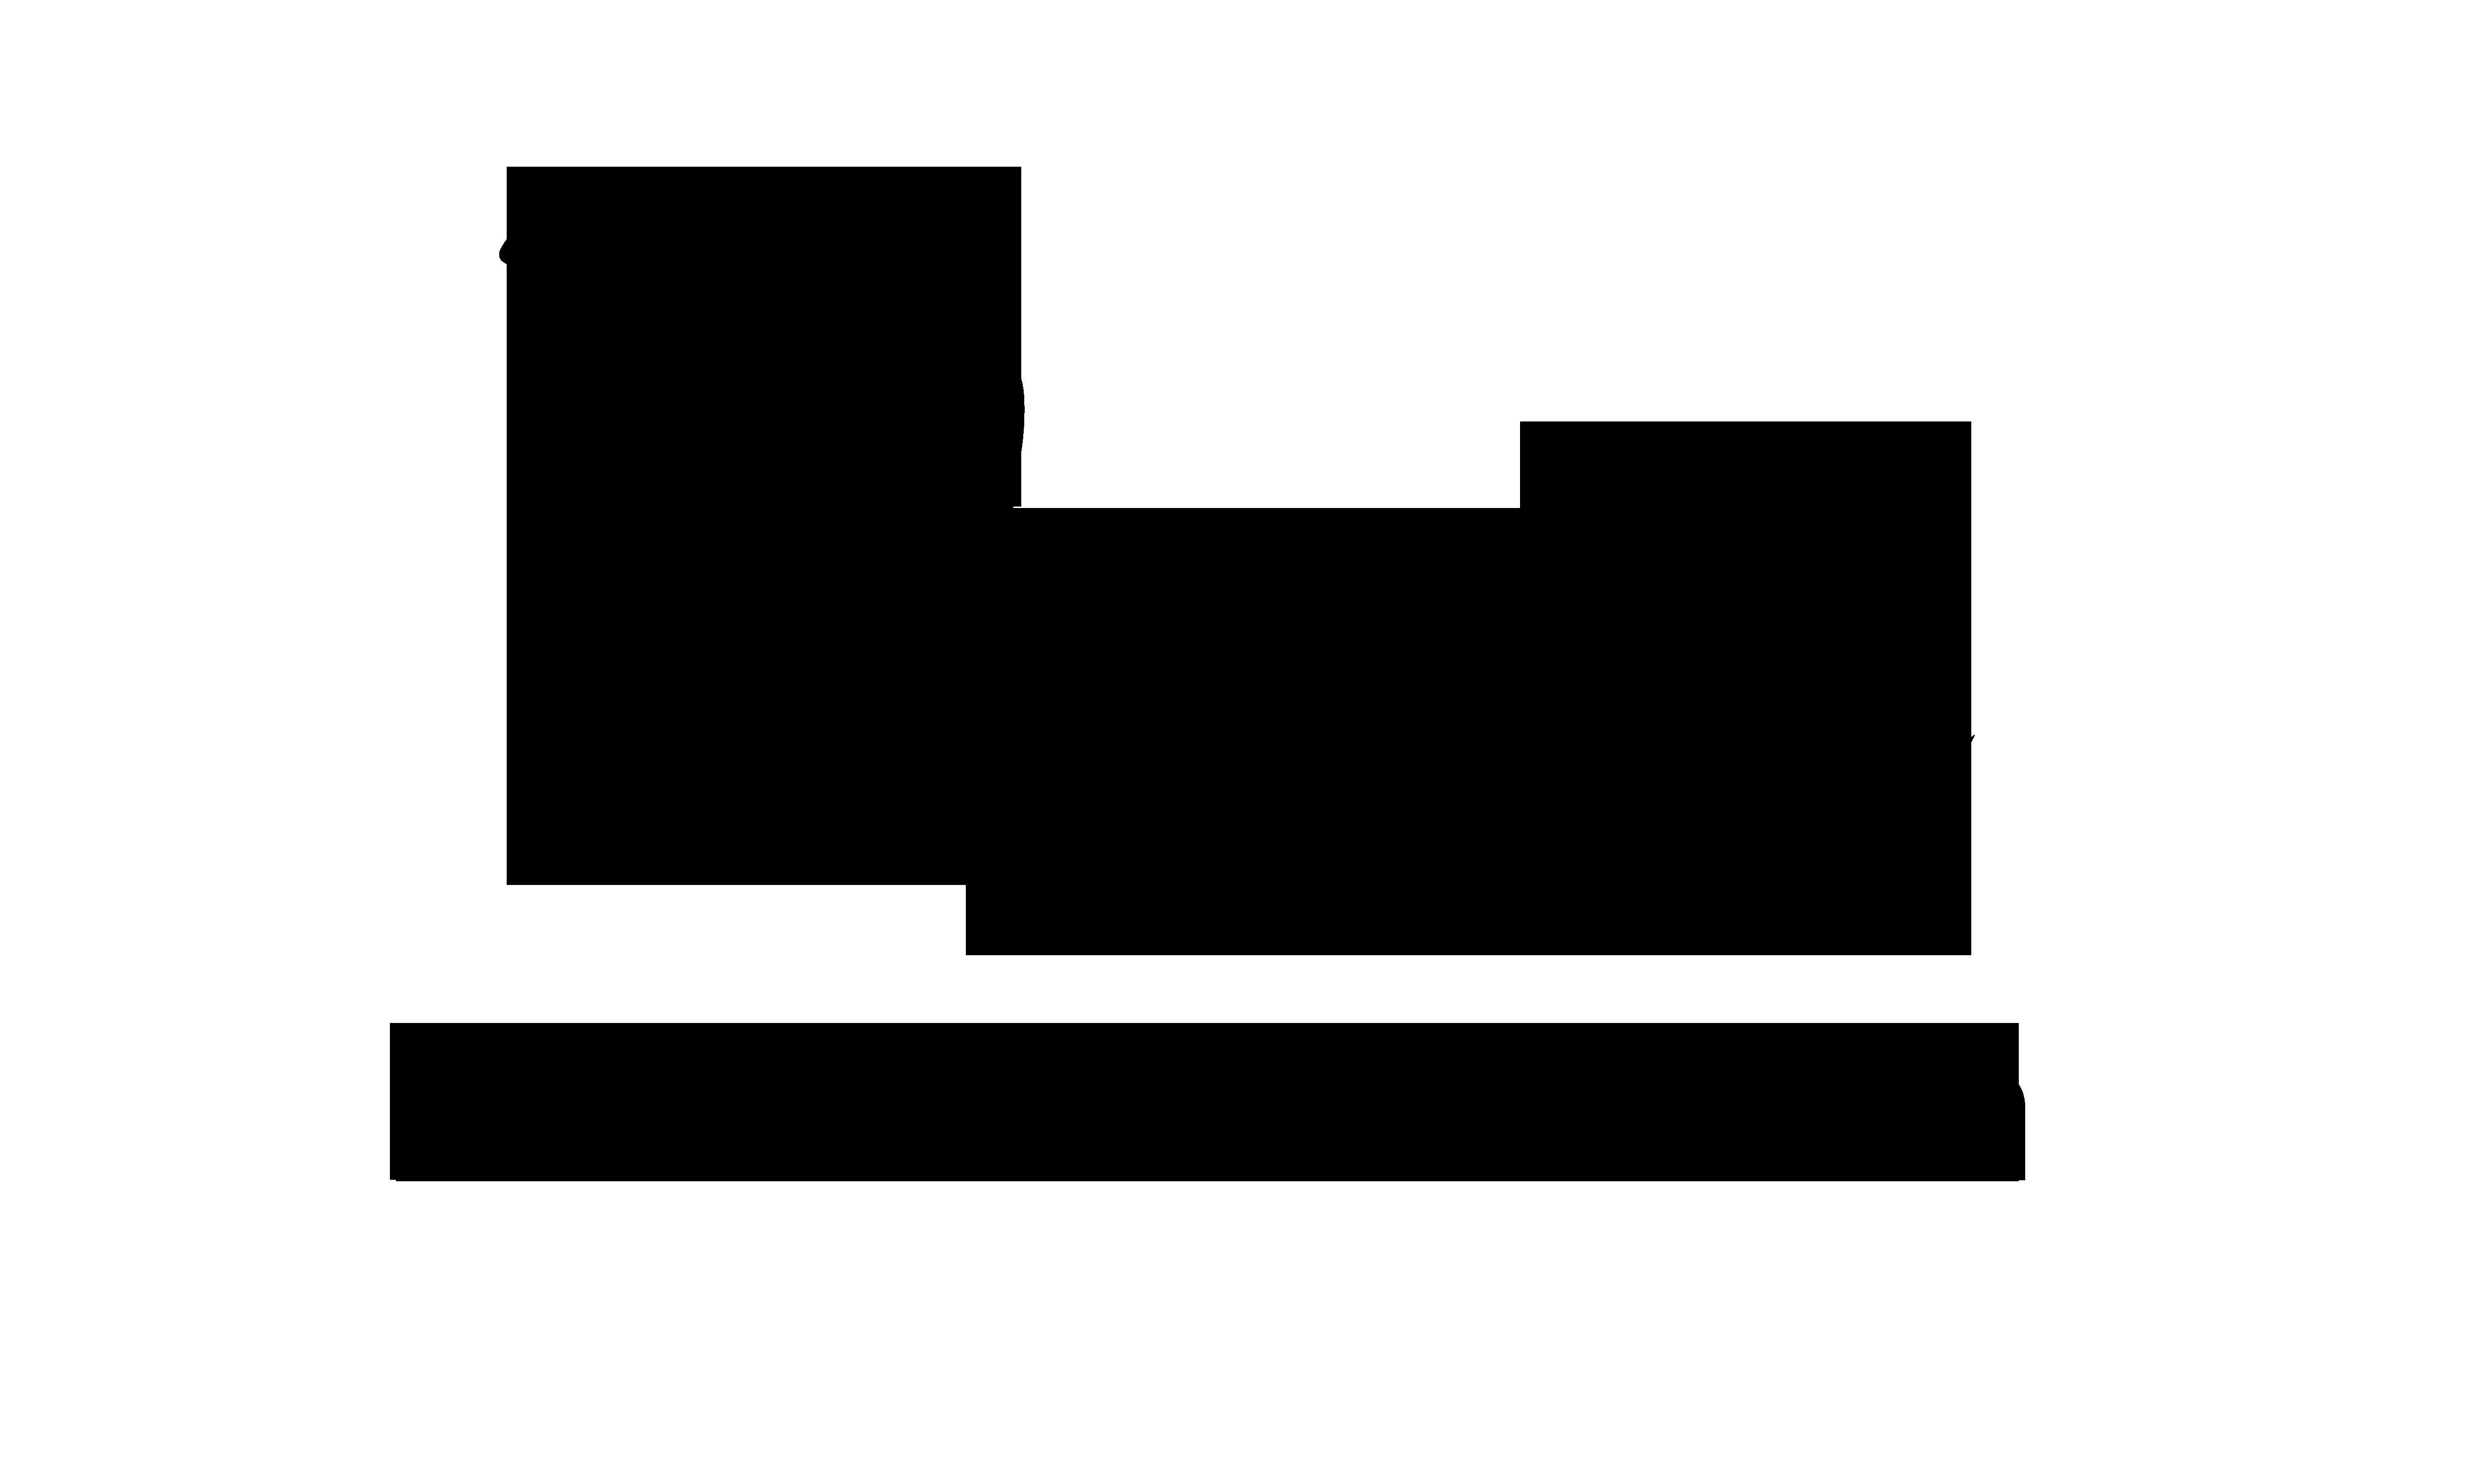 DARRYL_BLACKMAN_LOGO_1